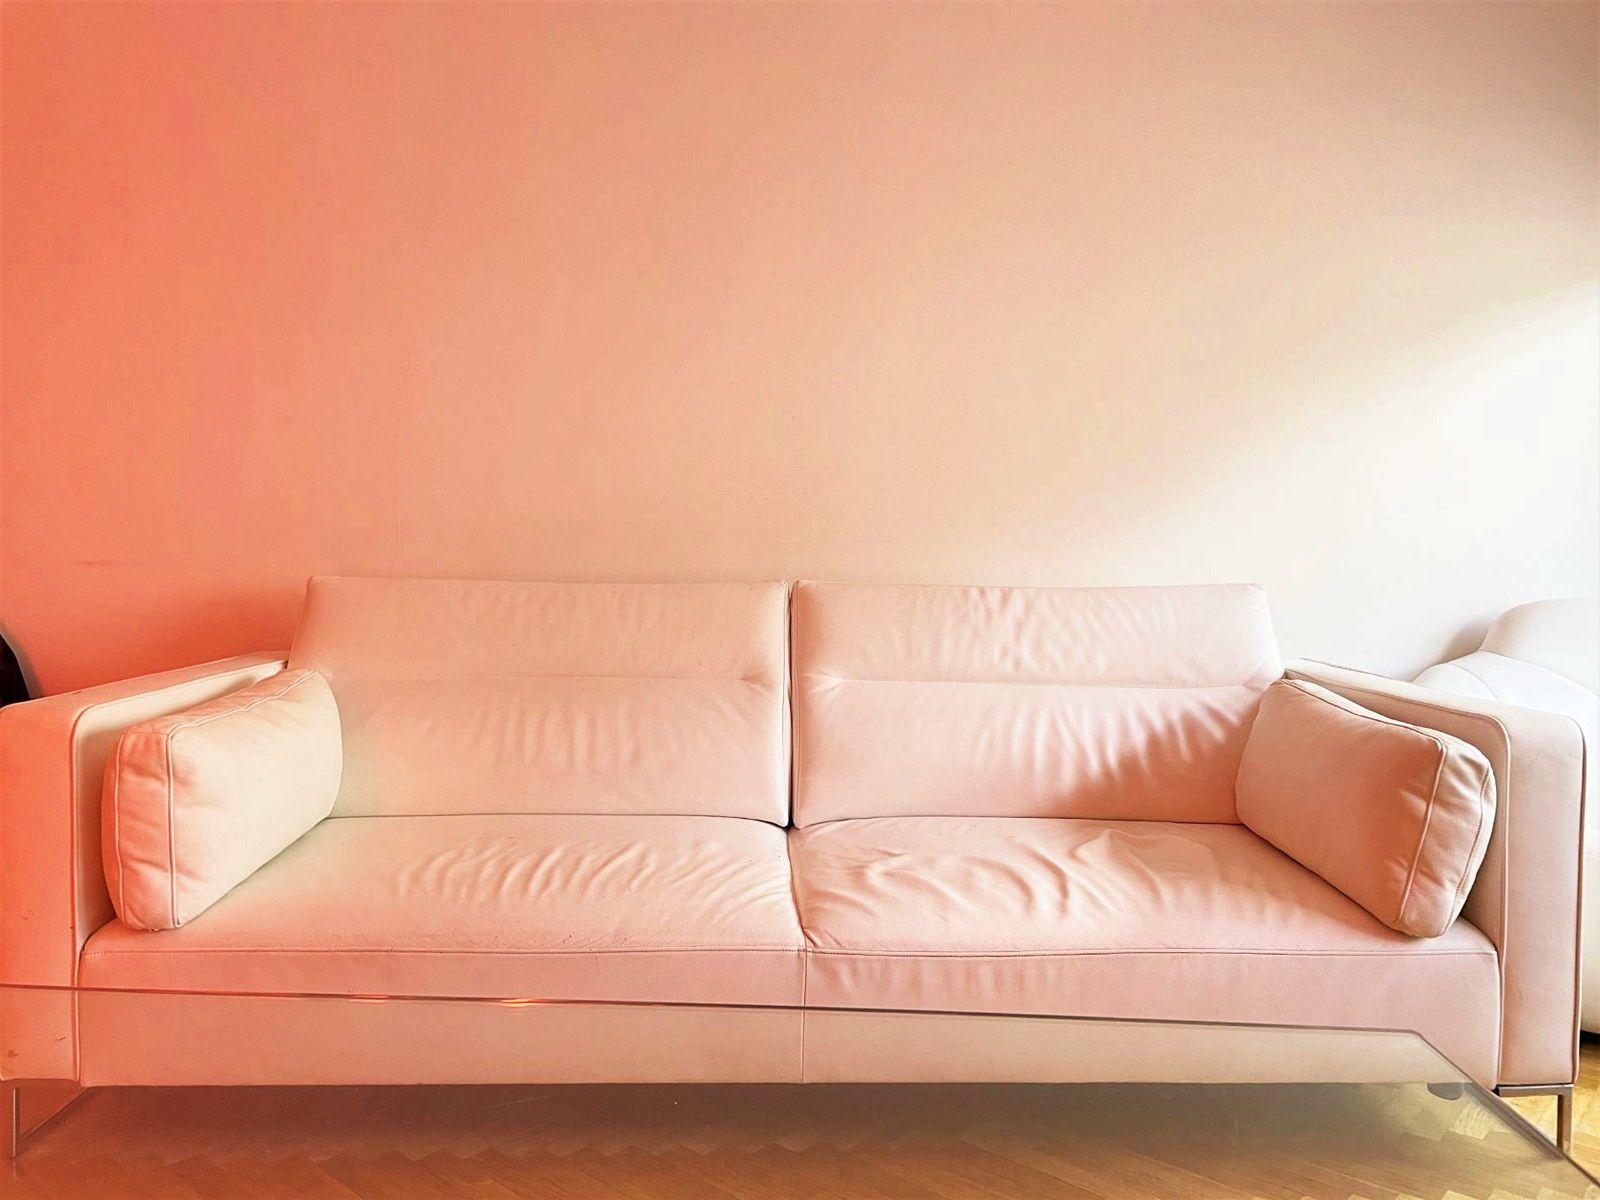 Vends canapé en cuir blanc URBANI